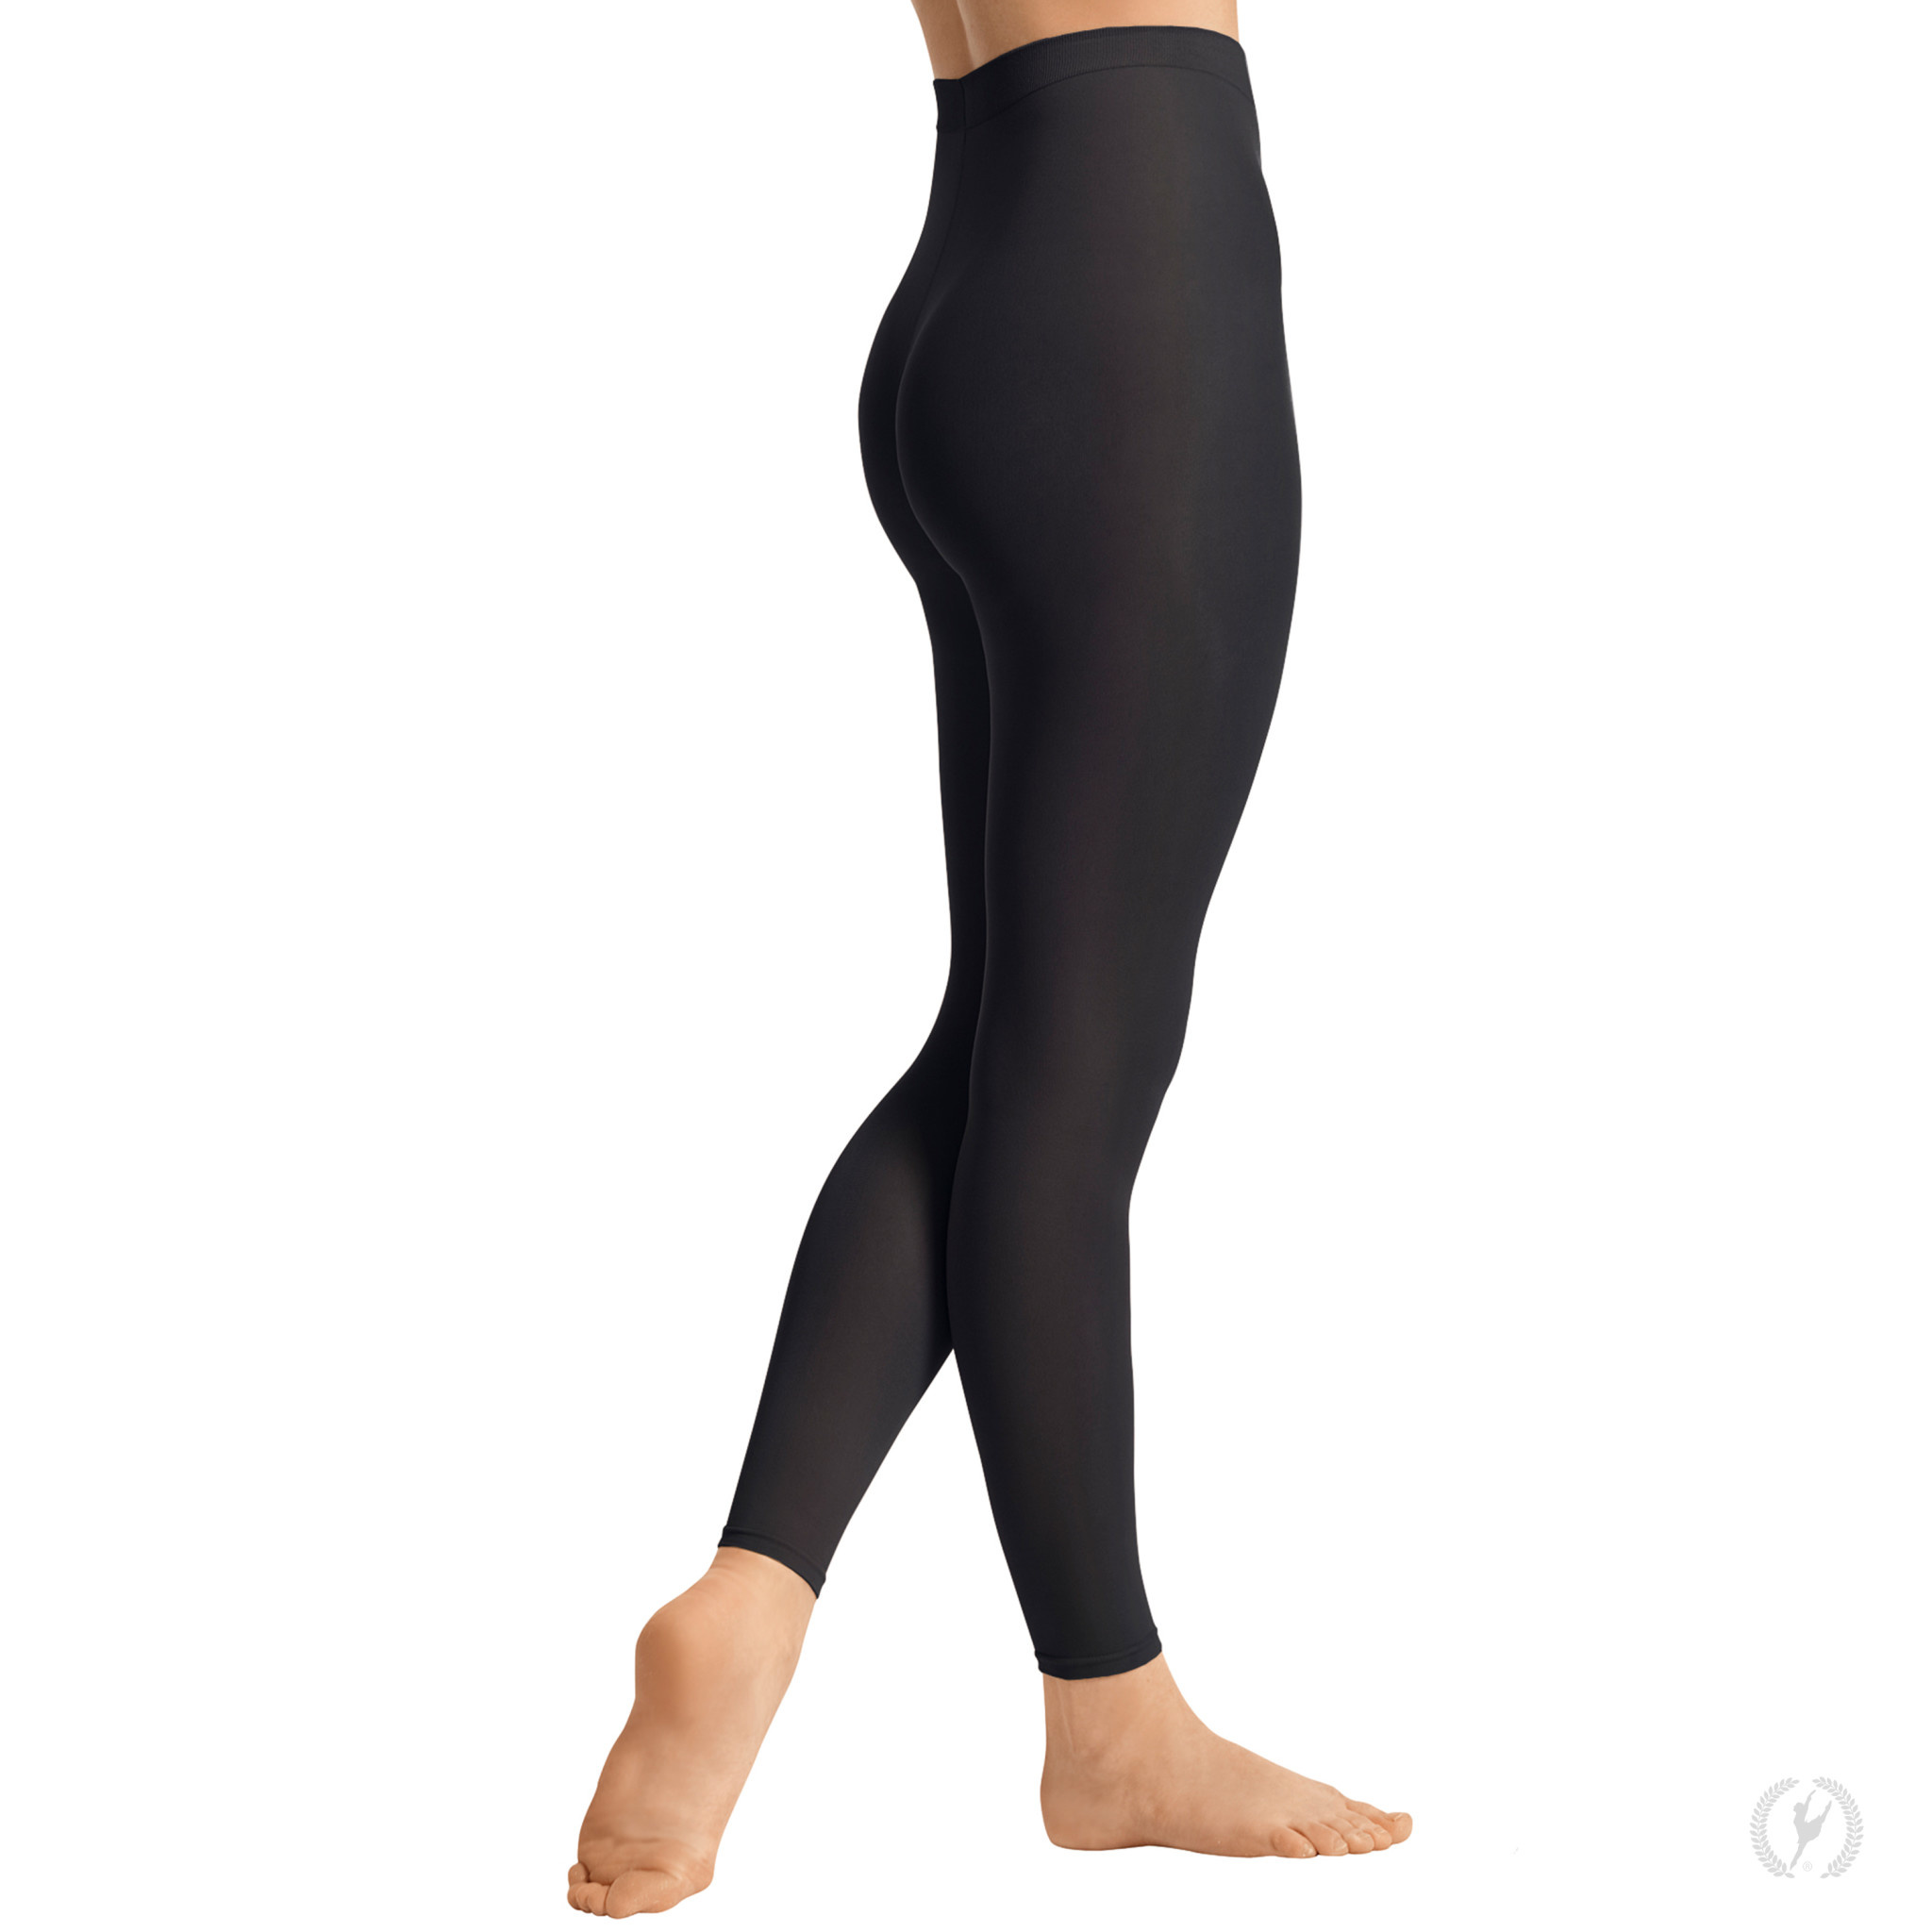 Eurotard 212 - Womens Non-Run Footless Tights with Soft Knit Waistband